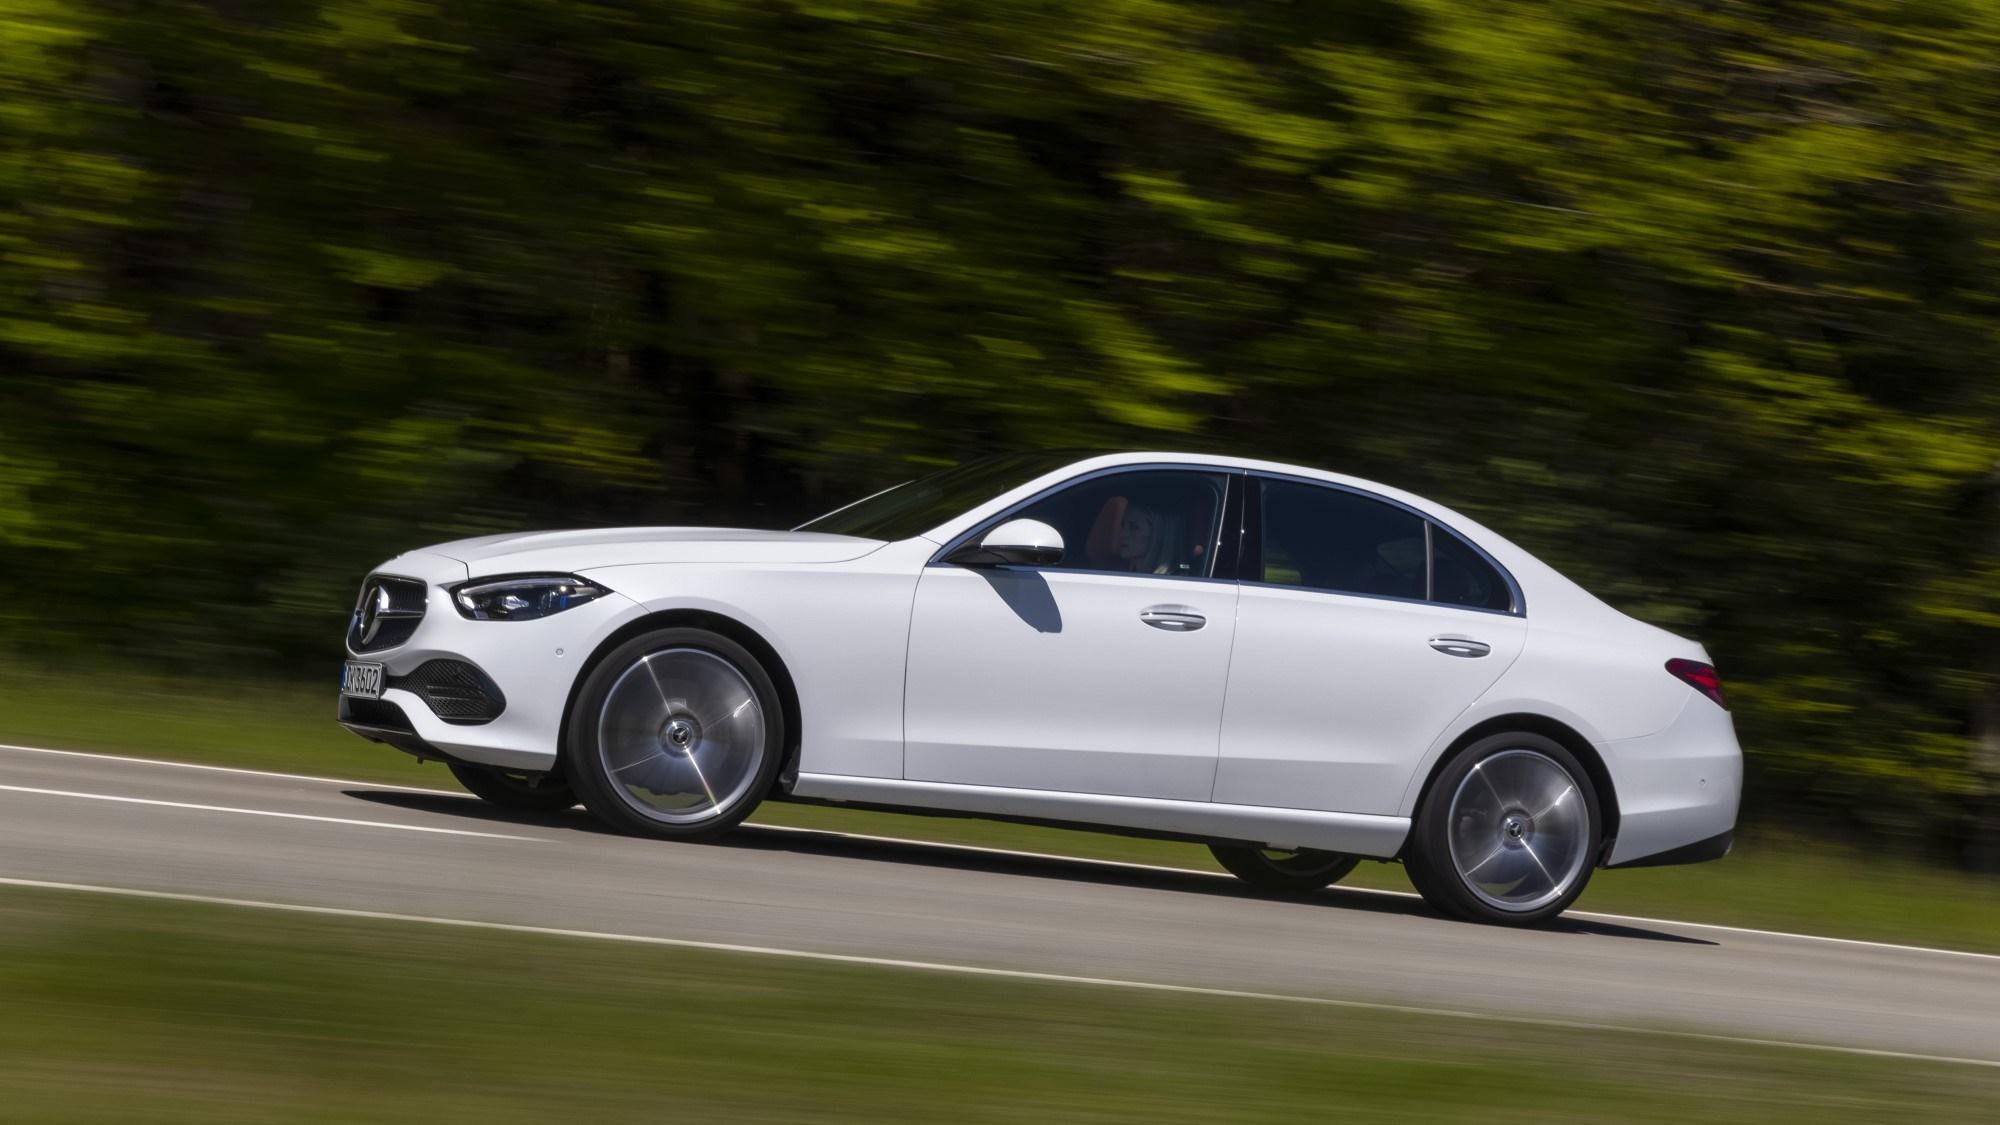 2021 Mercedes-Benz C-Class side profile